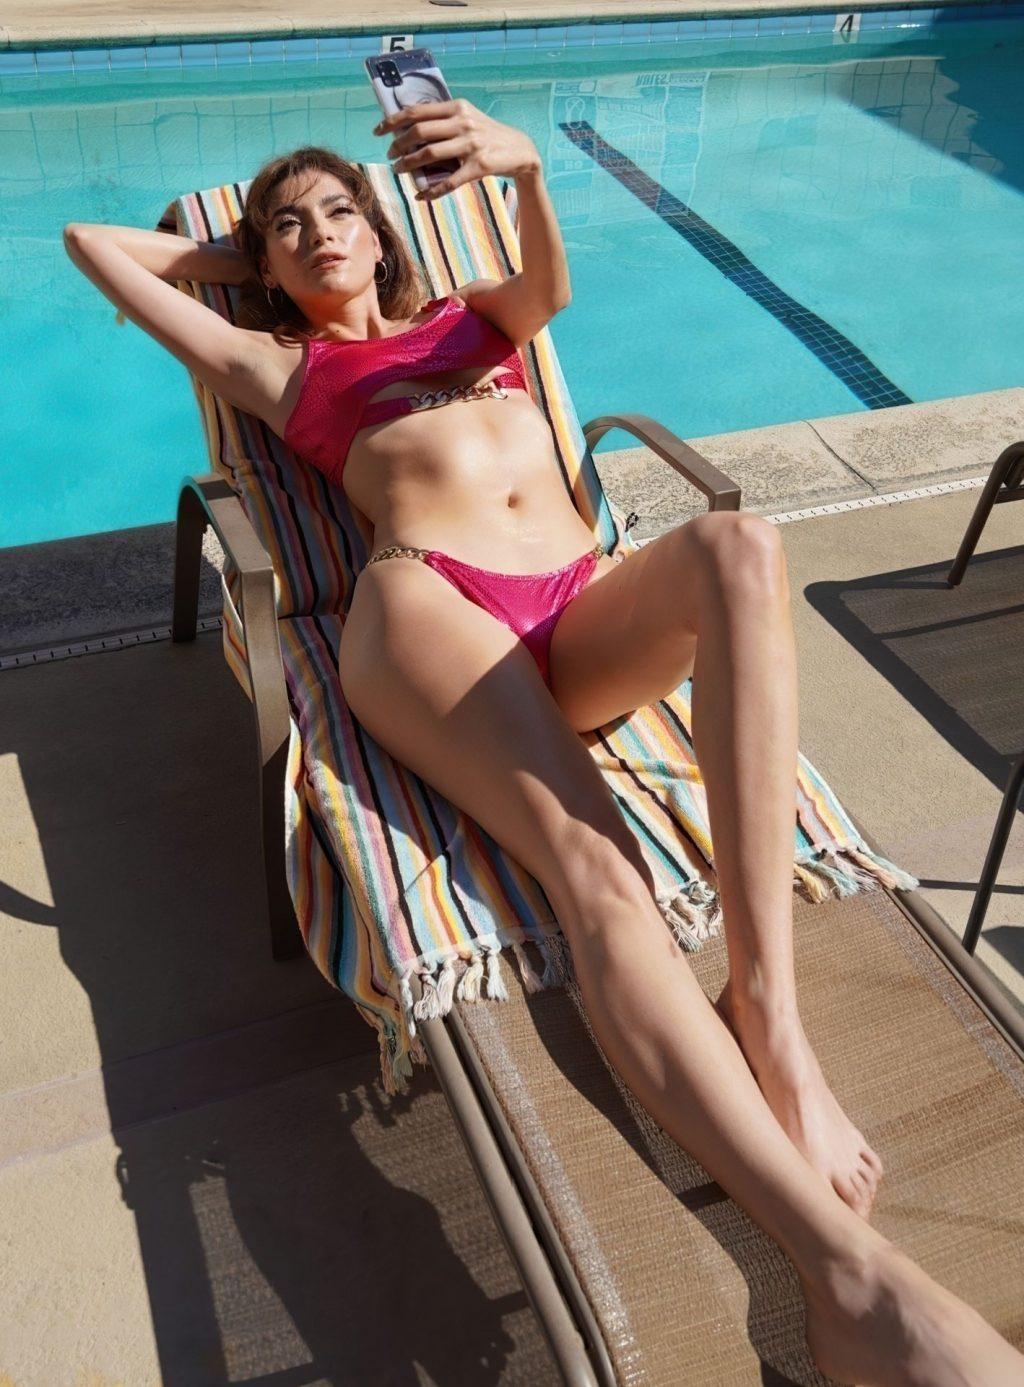 Blanca Blanco Enjoys a Day at the Pool (20 Photos)